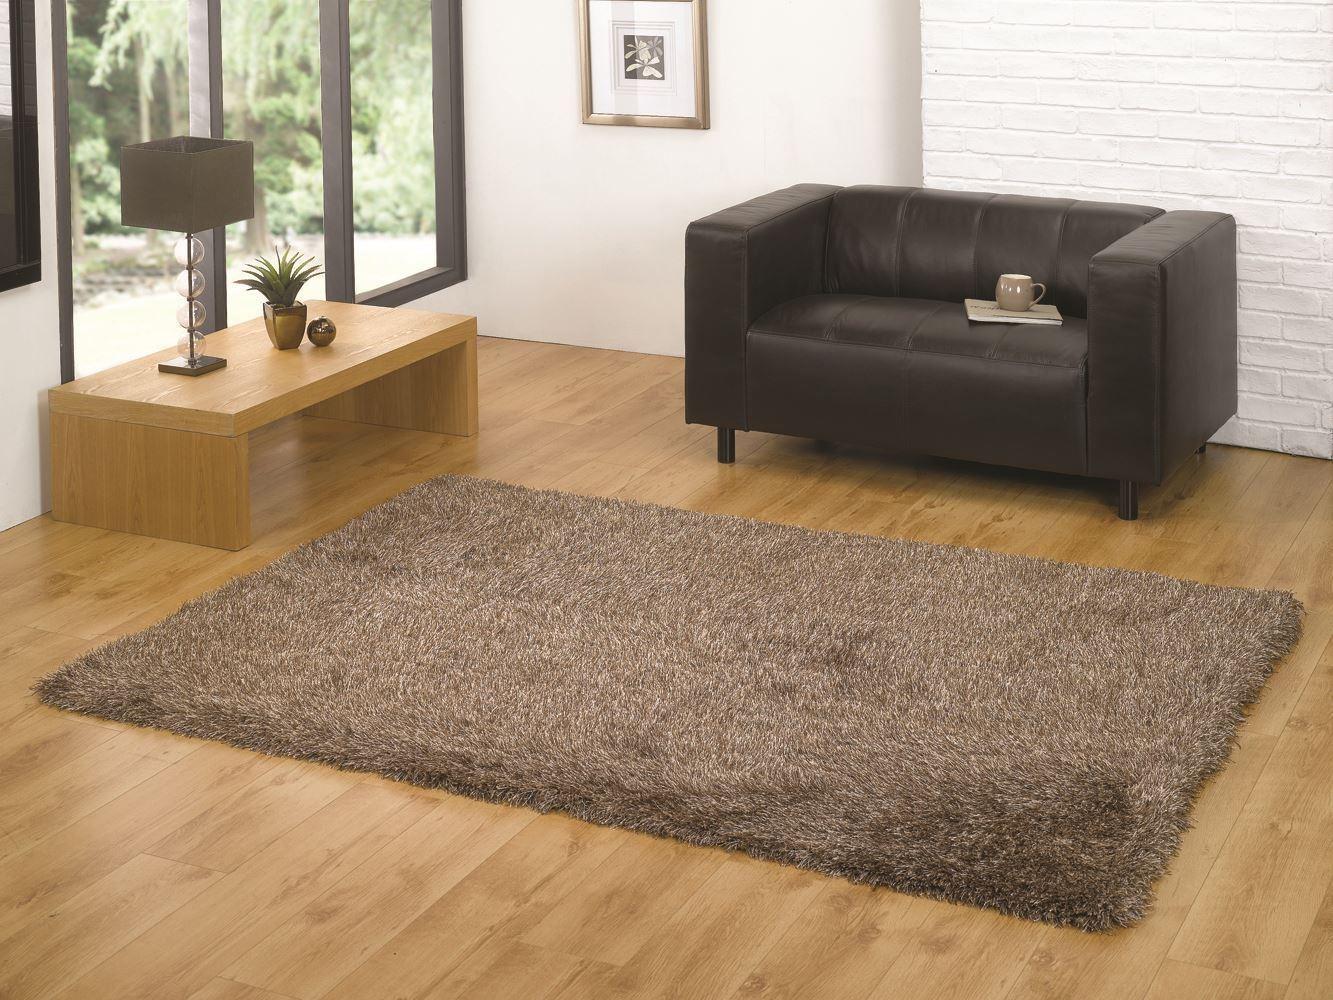 santa cruz tapis poil long profond epais moelleux rond rectangle flair tapis ebay. Black Bedroom Furniture Sets. Home Design Ideas